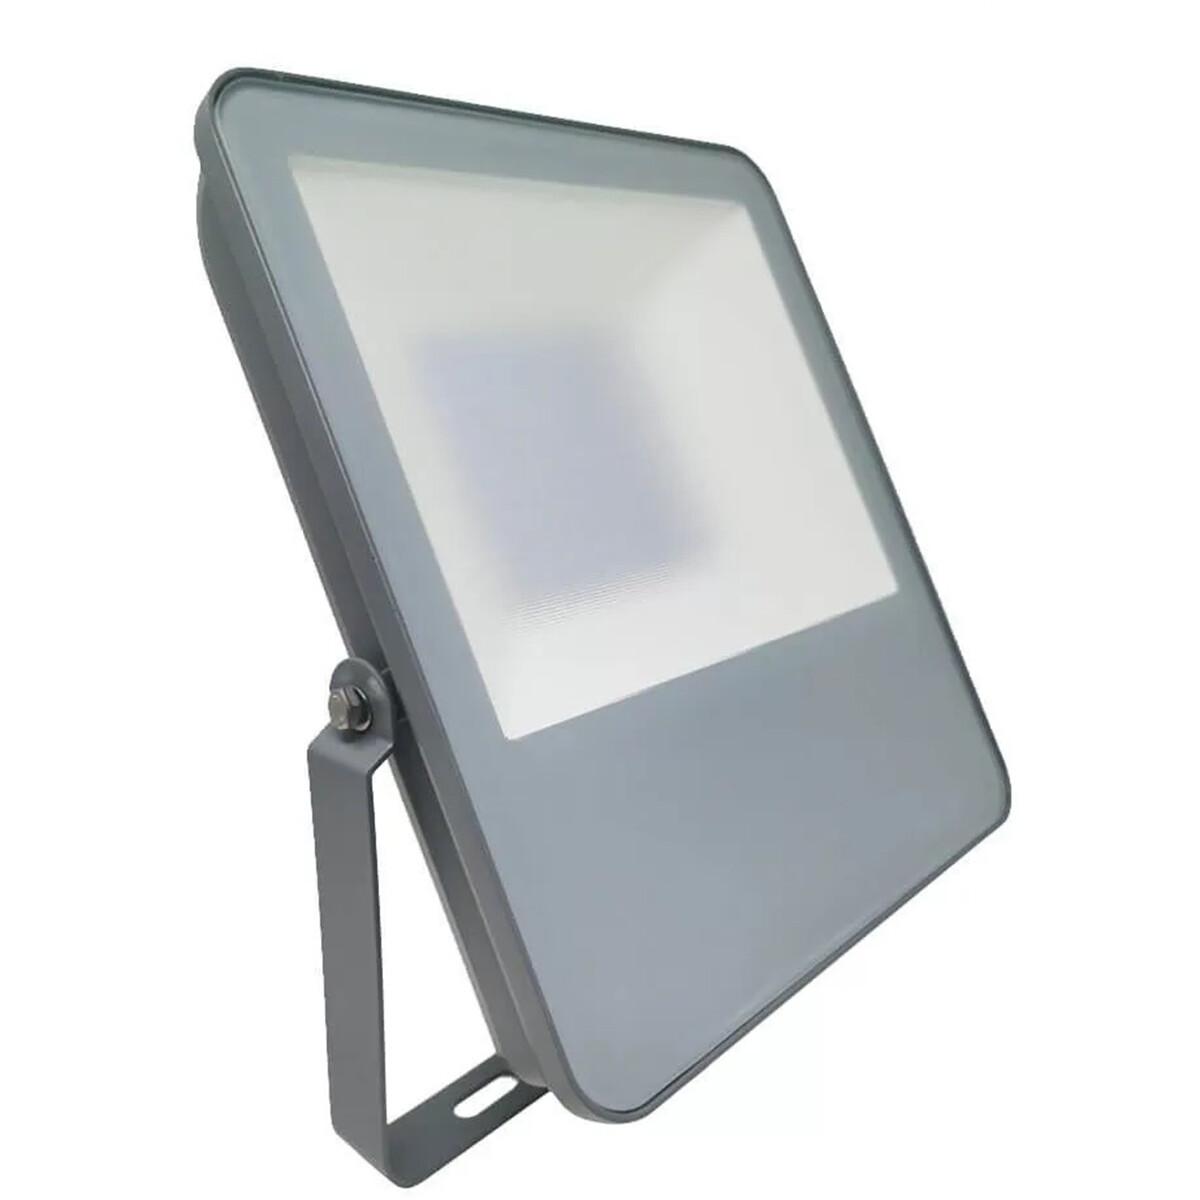 OSRAM - LED Bouwlamp - Facto Evola - 200 Watt - LED Schijnwerper - Warm Wit 3000K - Waterdicht IP65